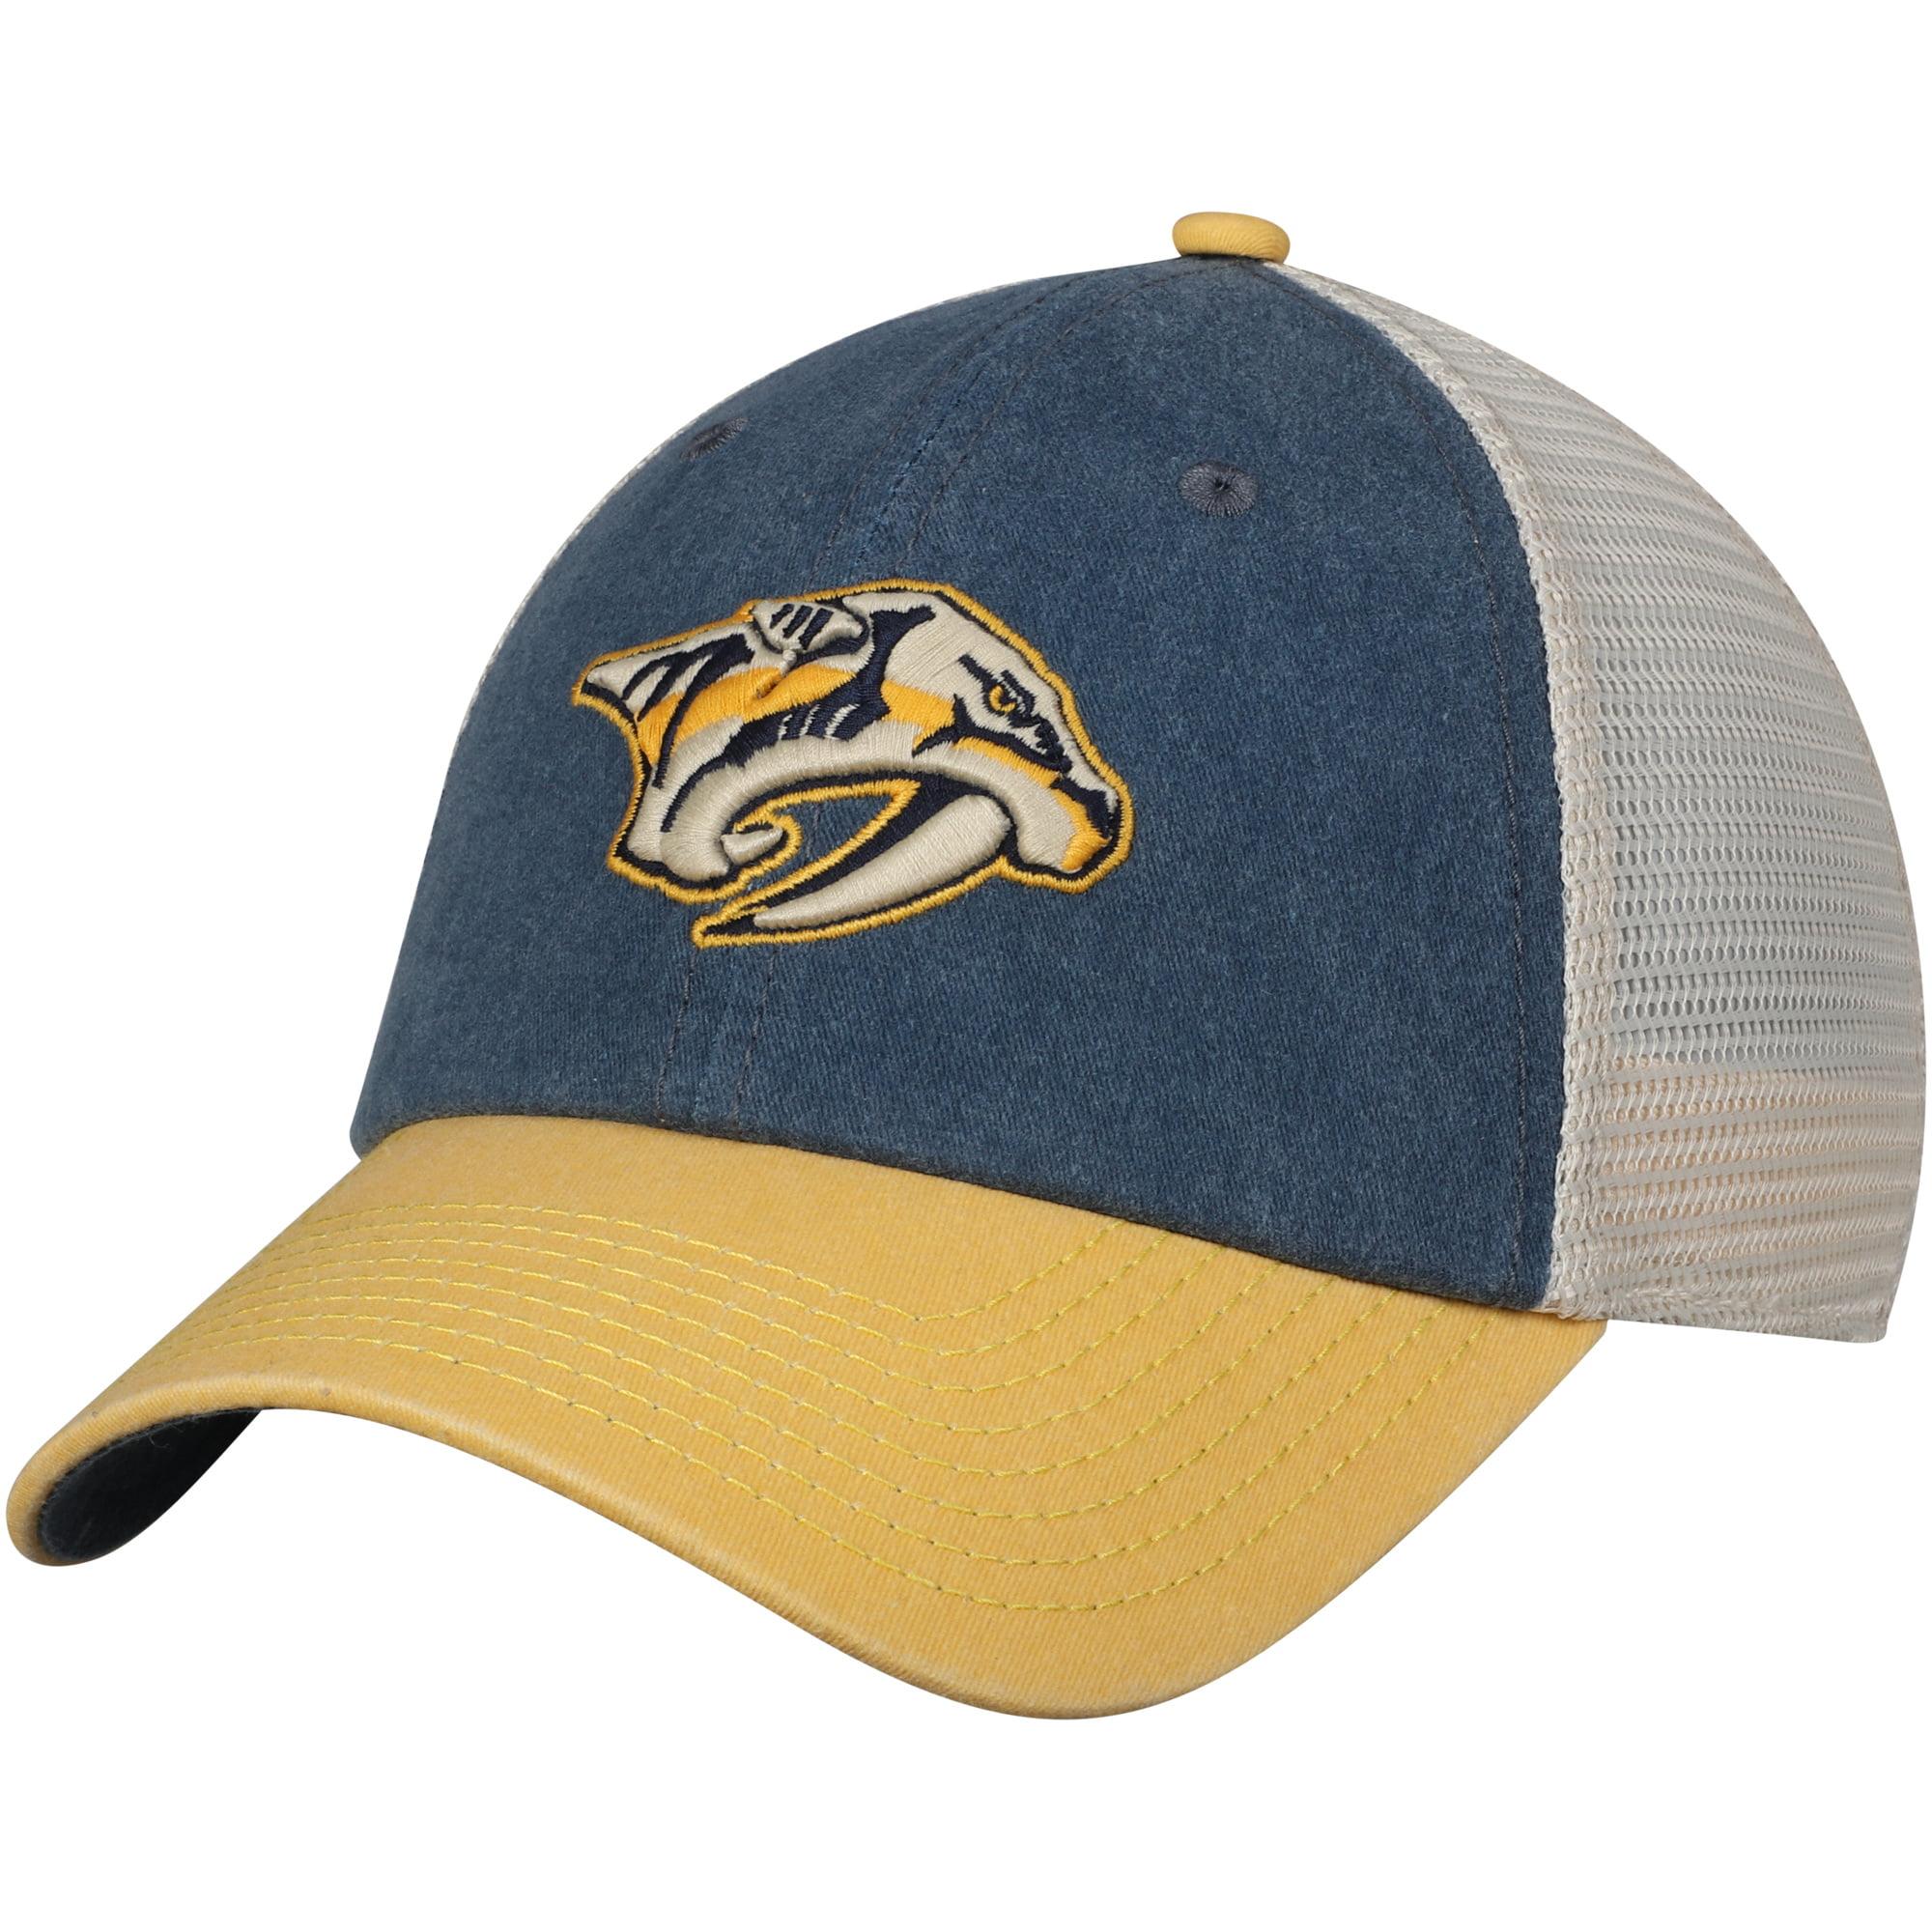 Nashville Predators American Needle Hanover Unstructured Adjustable Hat - Navy/Gold - OSFA